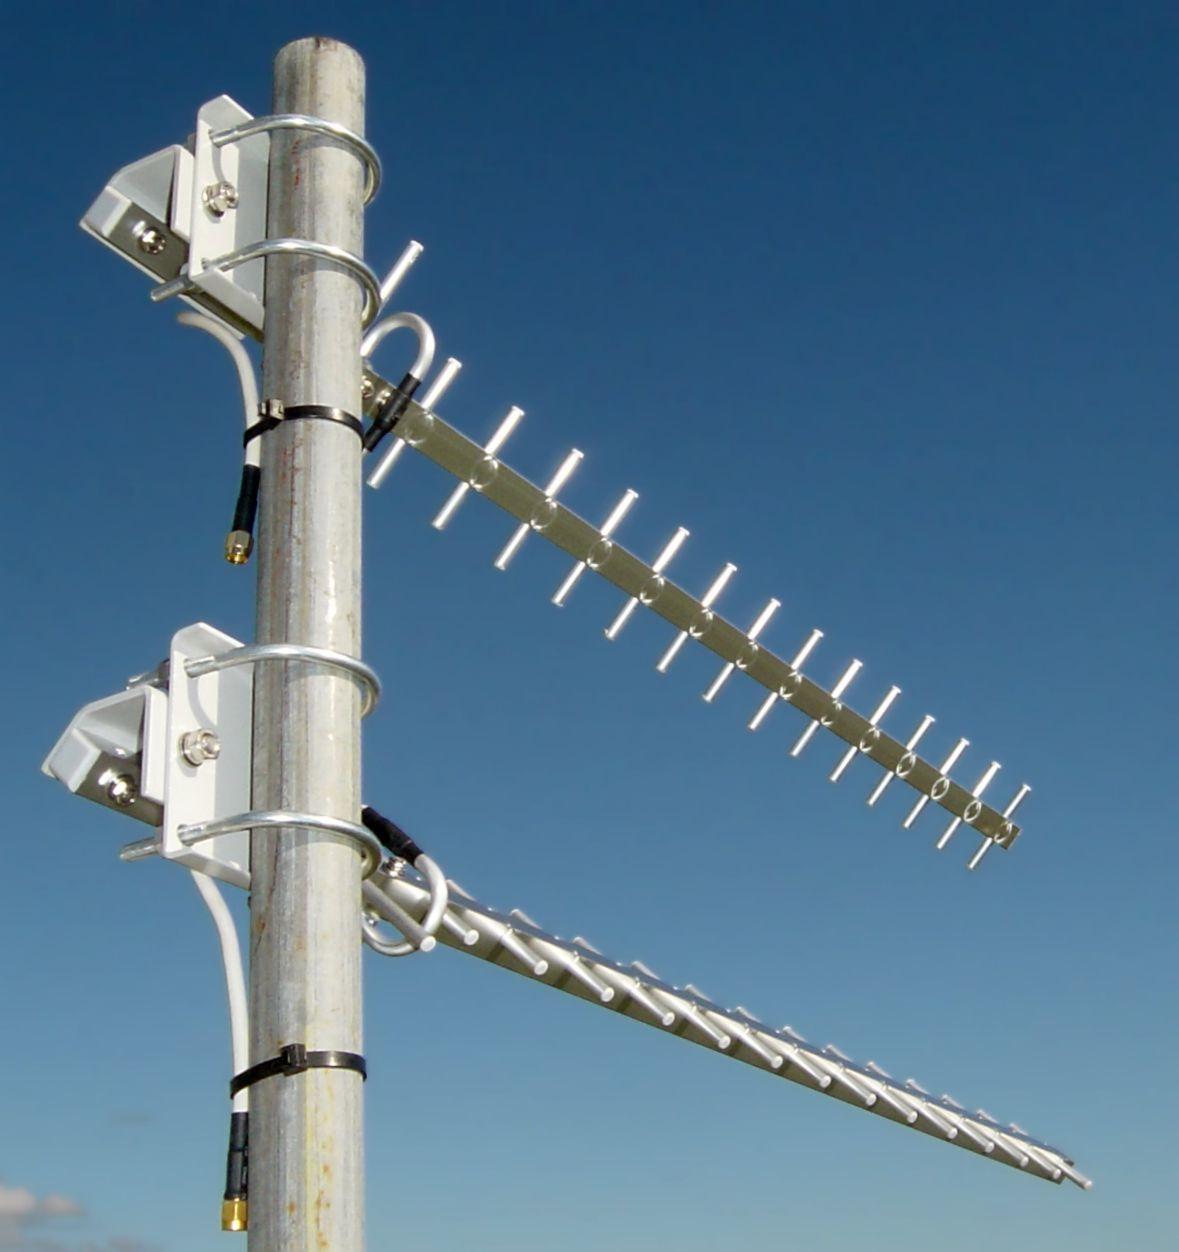 dual-16dbi-MIMO-4G-LTE-1800-mhz-yagi-antennas-3.jpg